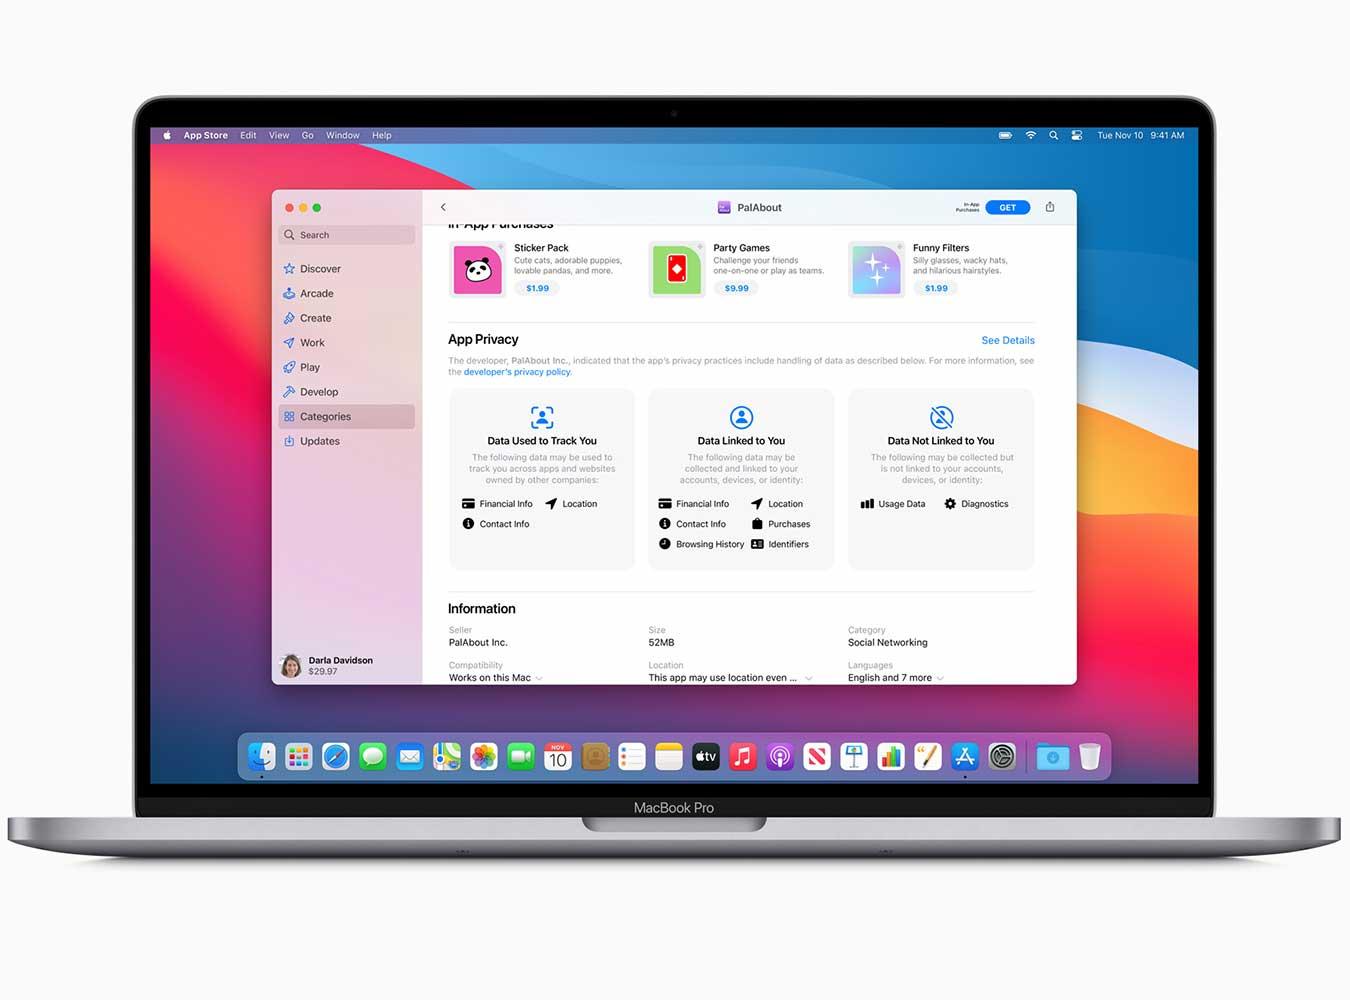 macbook privacy